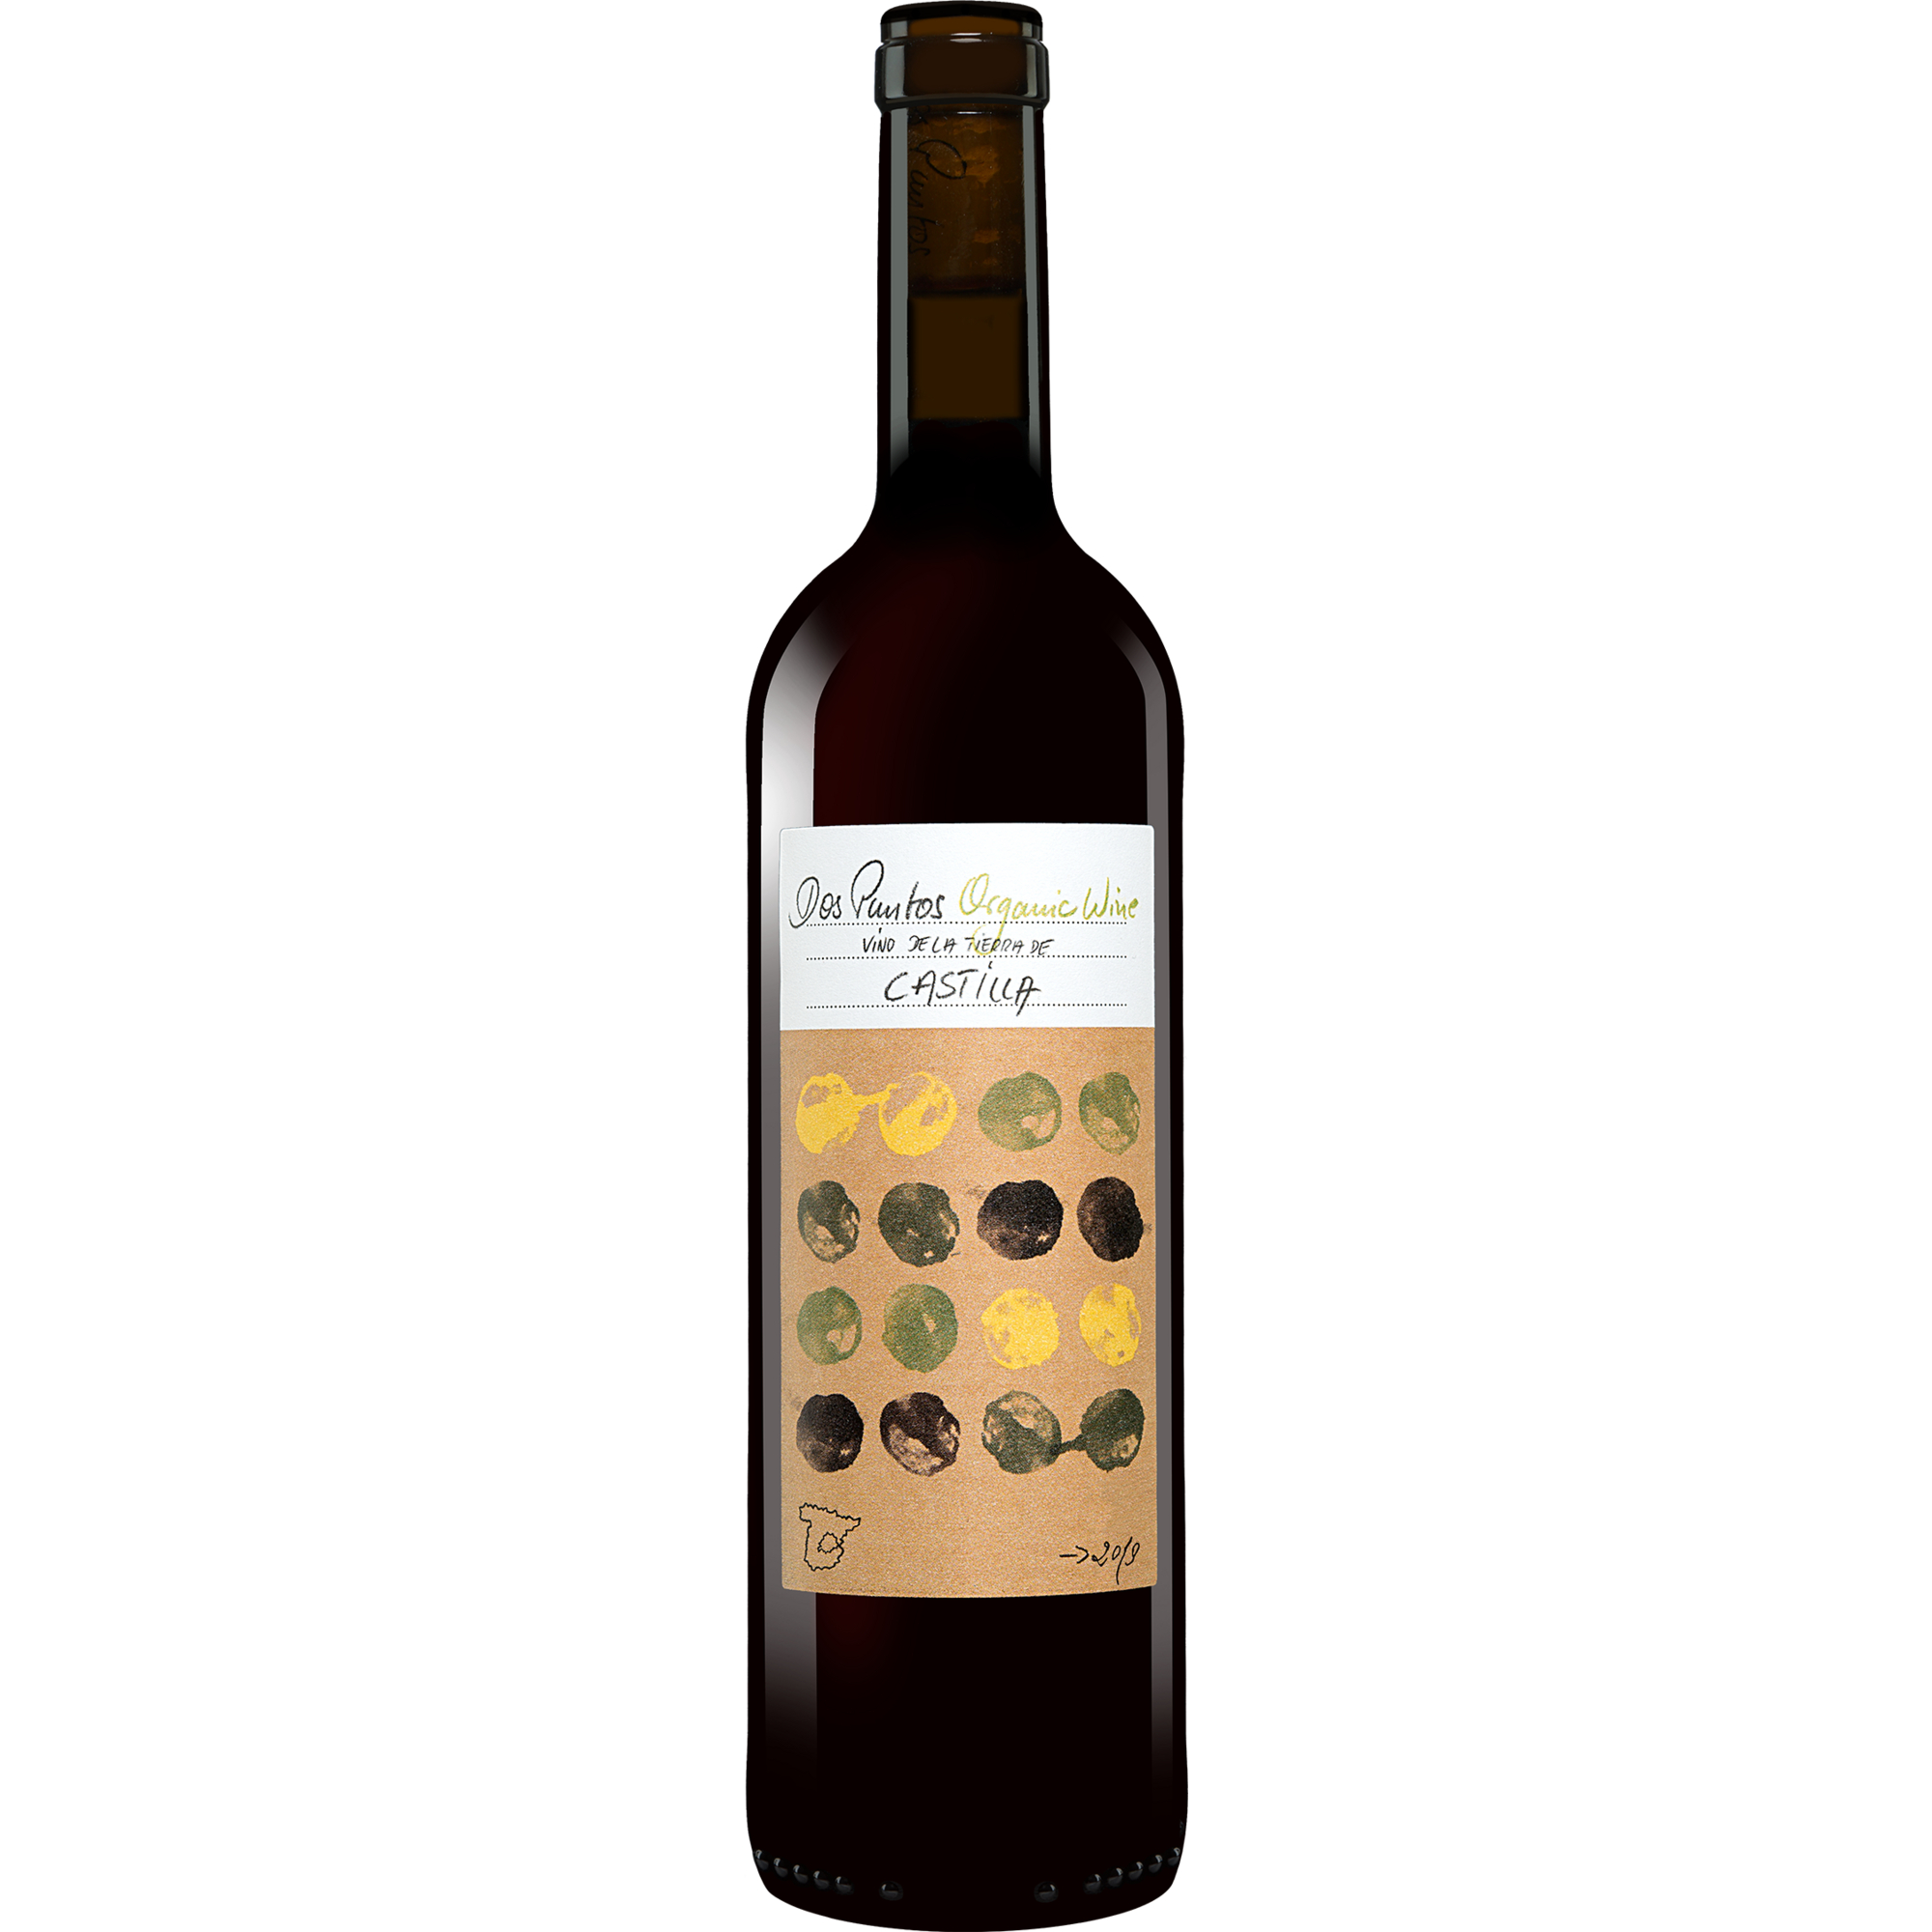 Image of Dos Puntos Tinto Organic 2019 0.75L 13.5% Vol. Rotwein Trocken aus Spanien